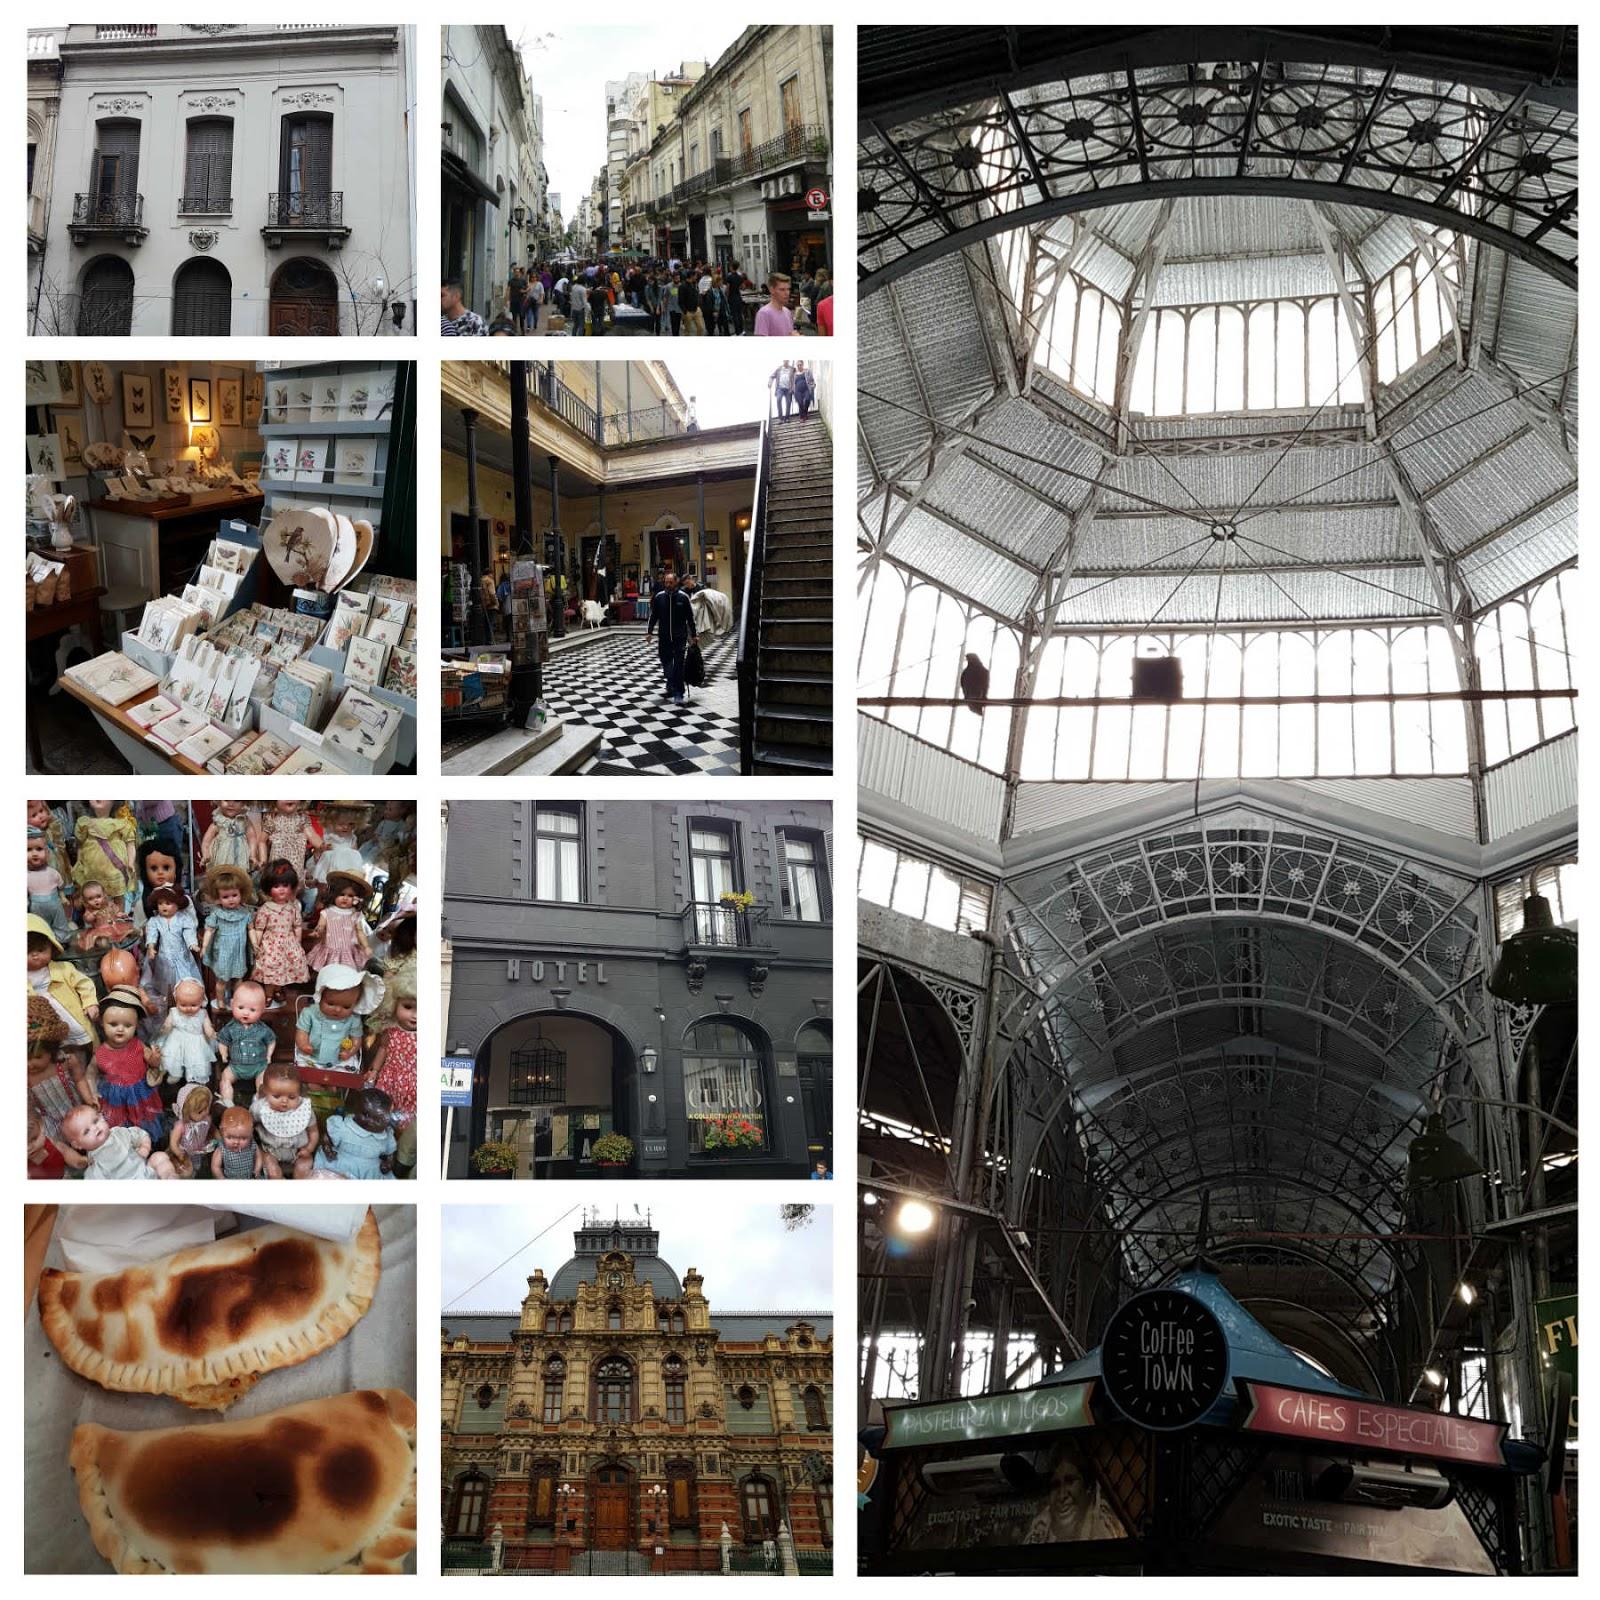 Feira de San Telmo, Mercado de San Telmo e Palácio das Águas Corrientes em Buenos Aires.